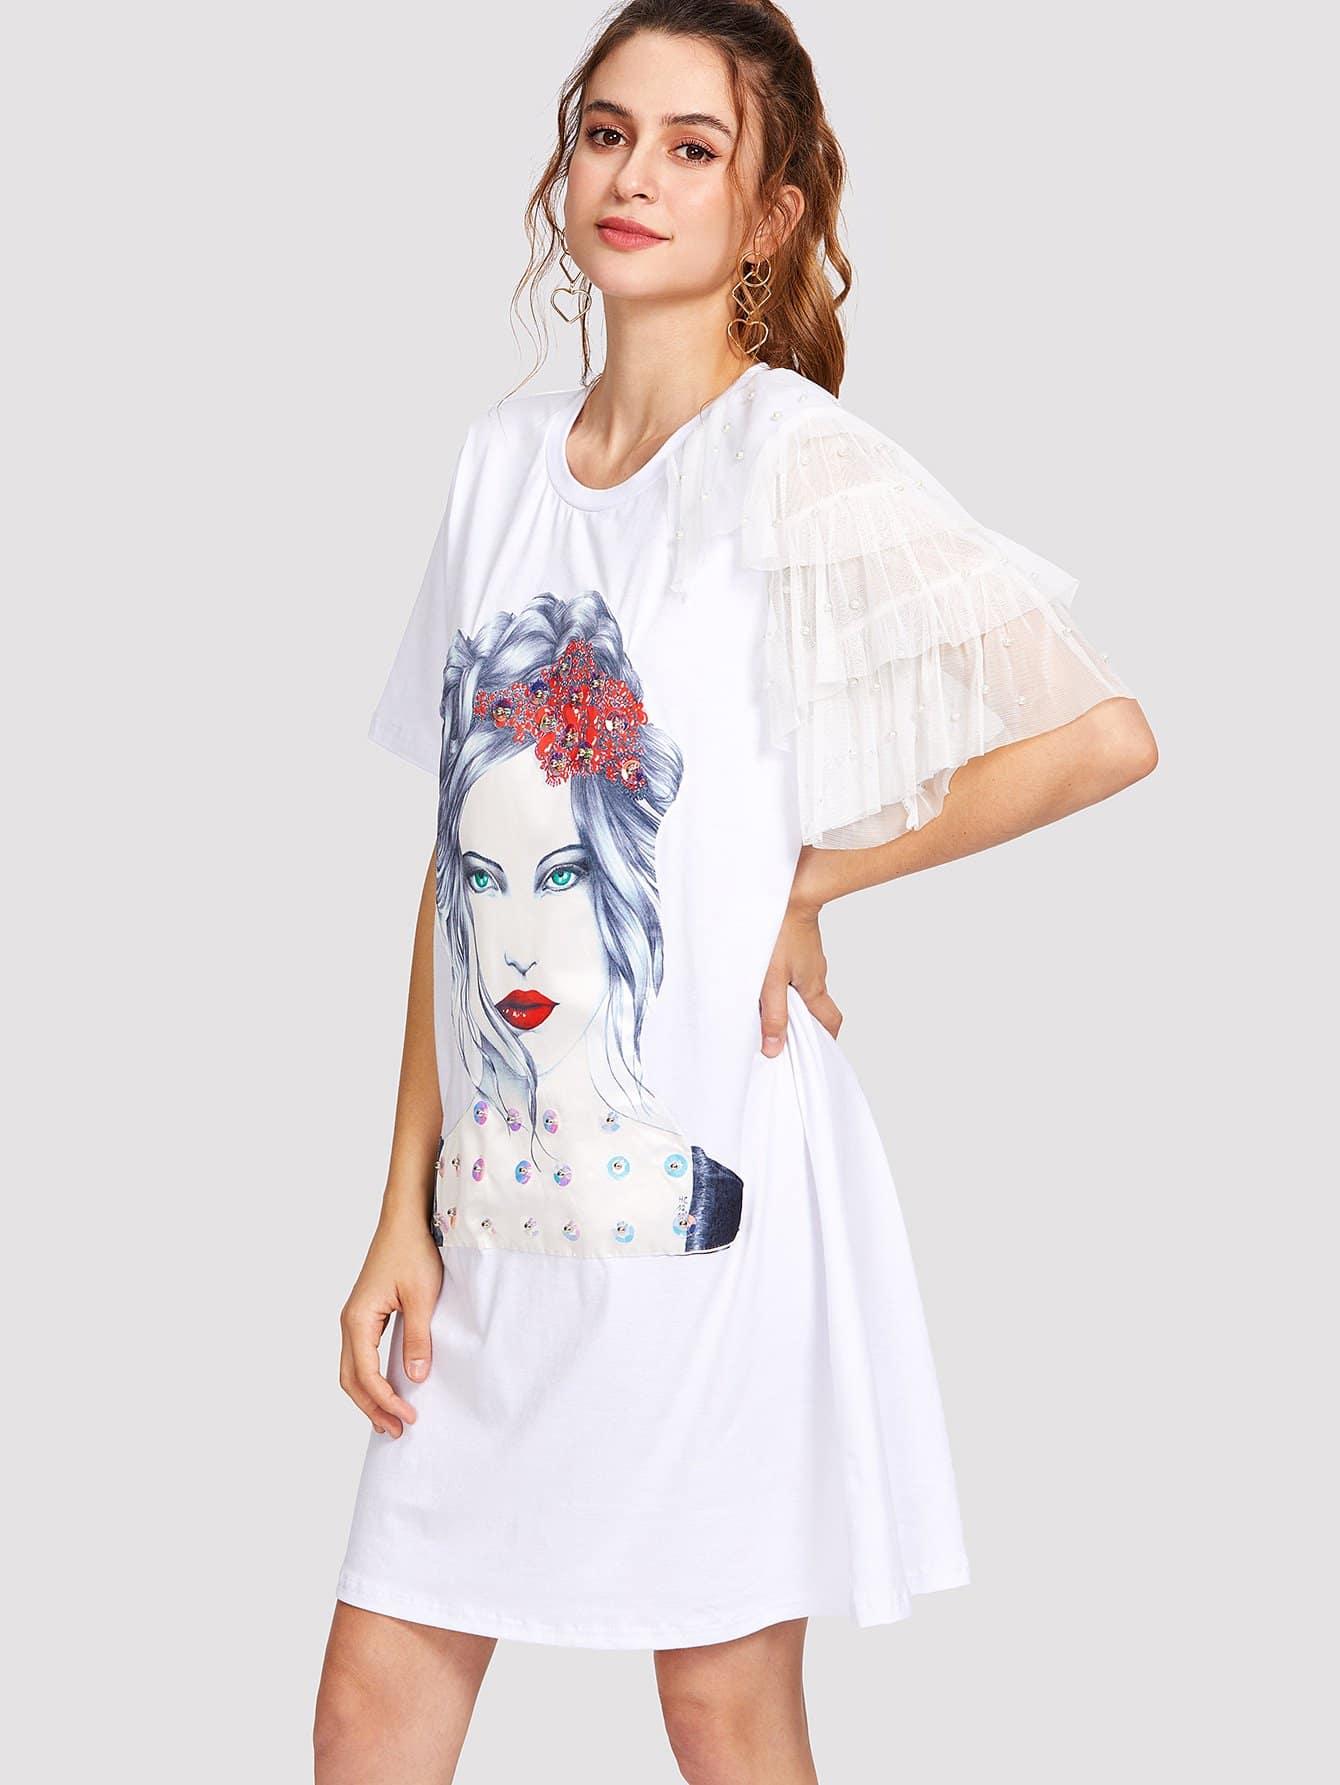 Tiered Mesh Sleeve Figure Print Dress swan print tiered mesh dress